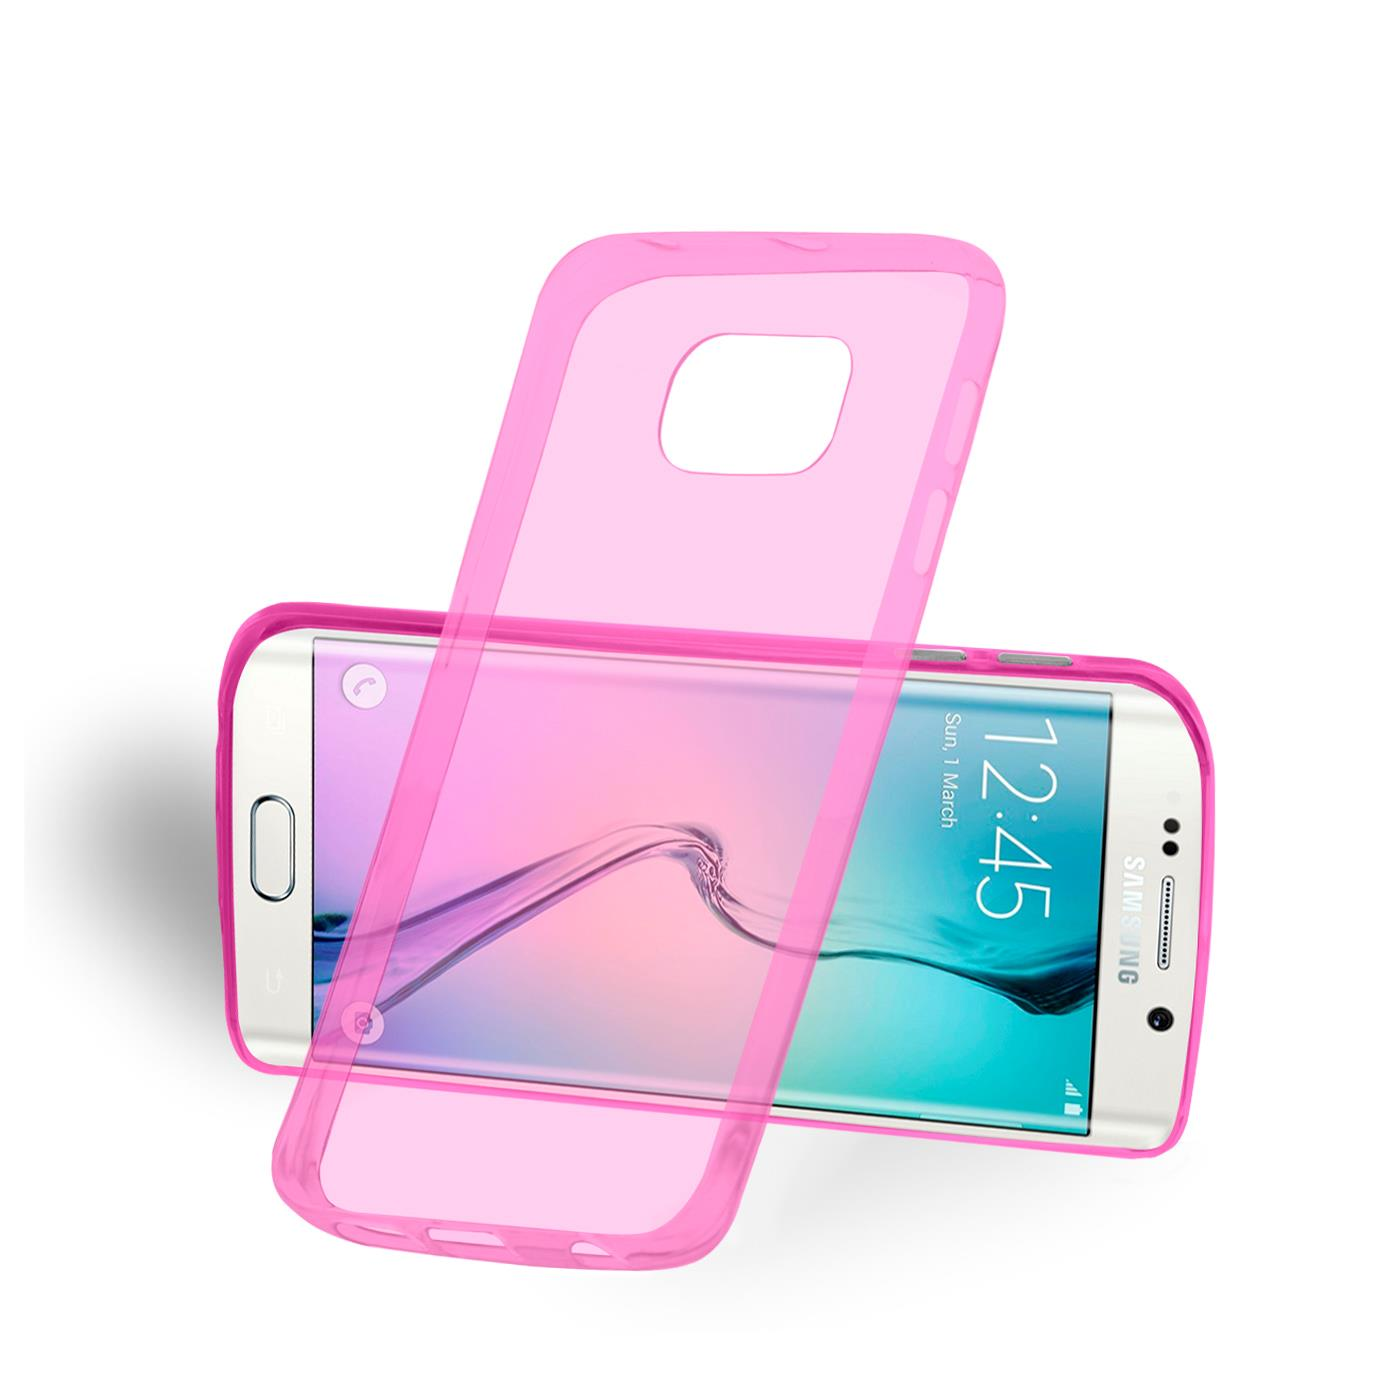 Samsung-Galaxy-s6-Edge-Plus-Thin-Silikon-Klar-Case-Cover-Ultra-Slim-Stossfeste Indexbild 25